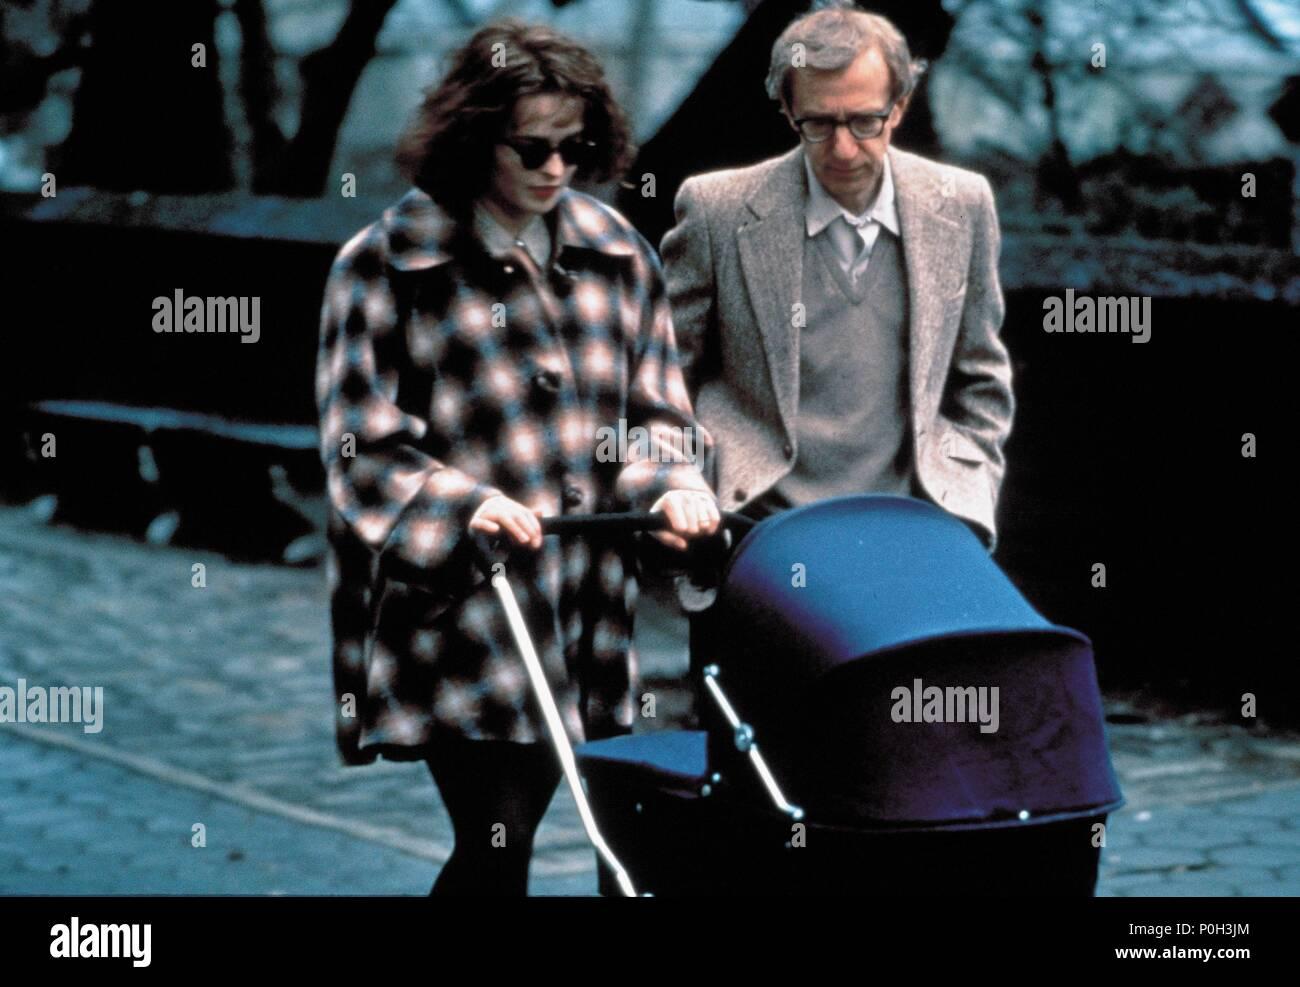 Original Film Title: MIGHTY APHRODITE.  English Title: MIGHTY APHRODITE.  Film Director: WOODY ALLEN.  Year: 1995.  Stars: HELENA BONHAM CARTER; WOODY ALLEN. Credit: MIRAMAX / Album - Stock Image